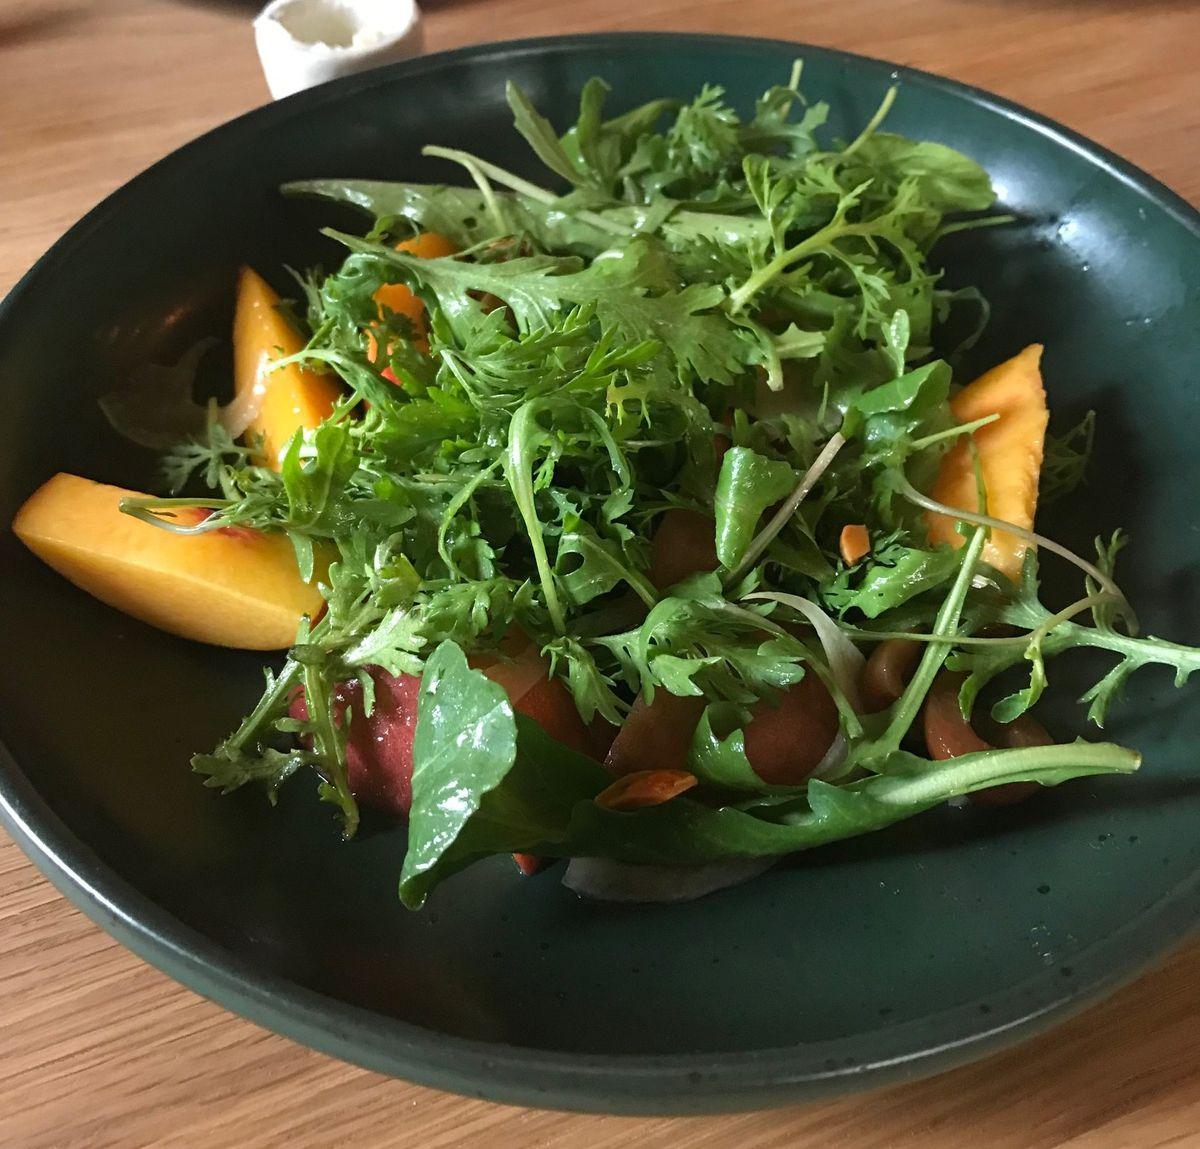 Stonefruit salad from Octavia